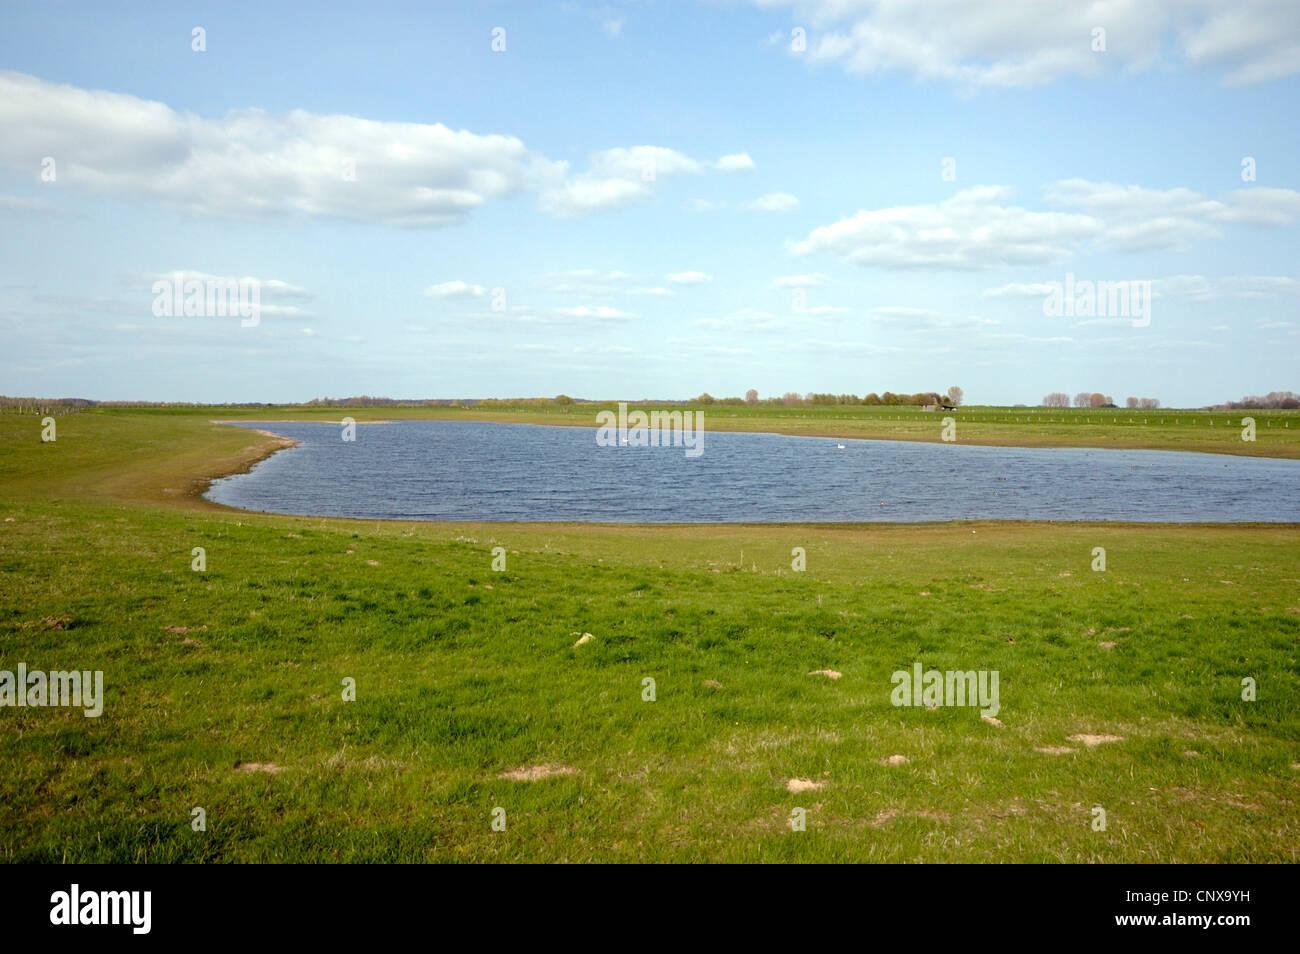 meadow at Rhine river on Bislicher Insel, Germany, North Rhine-Westphalia, Nature Reserve Bislicher Insel Stock Photo